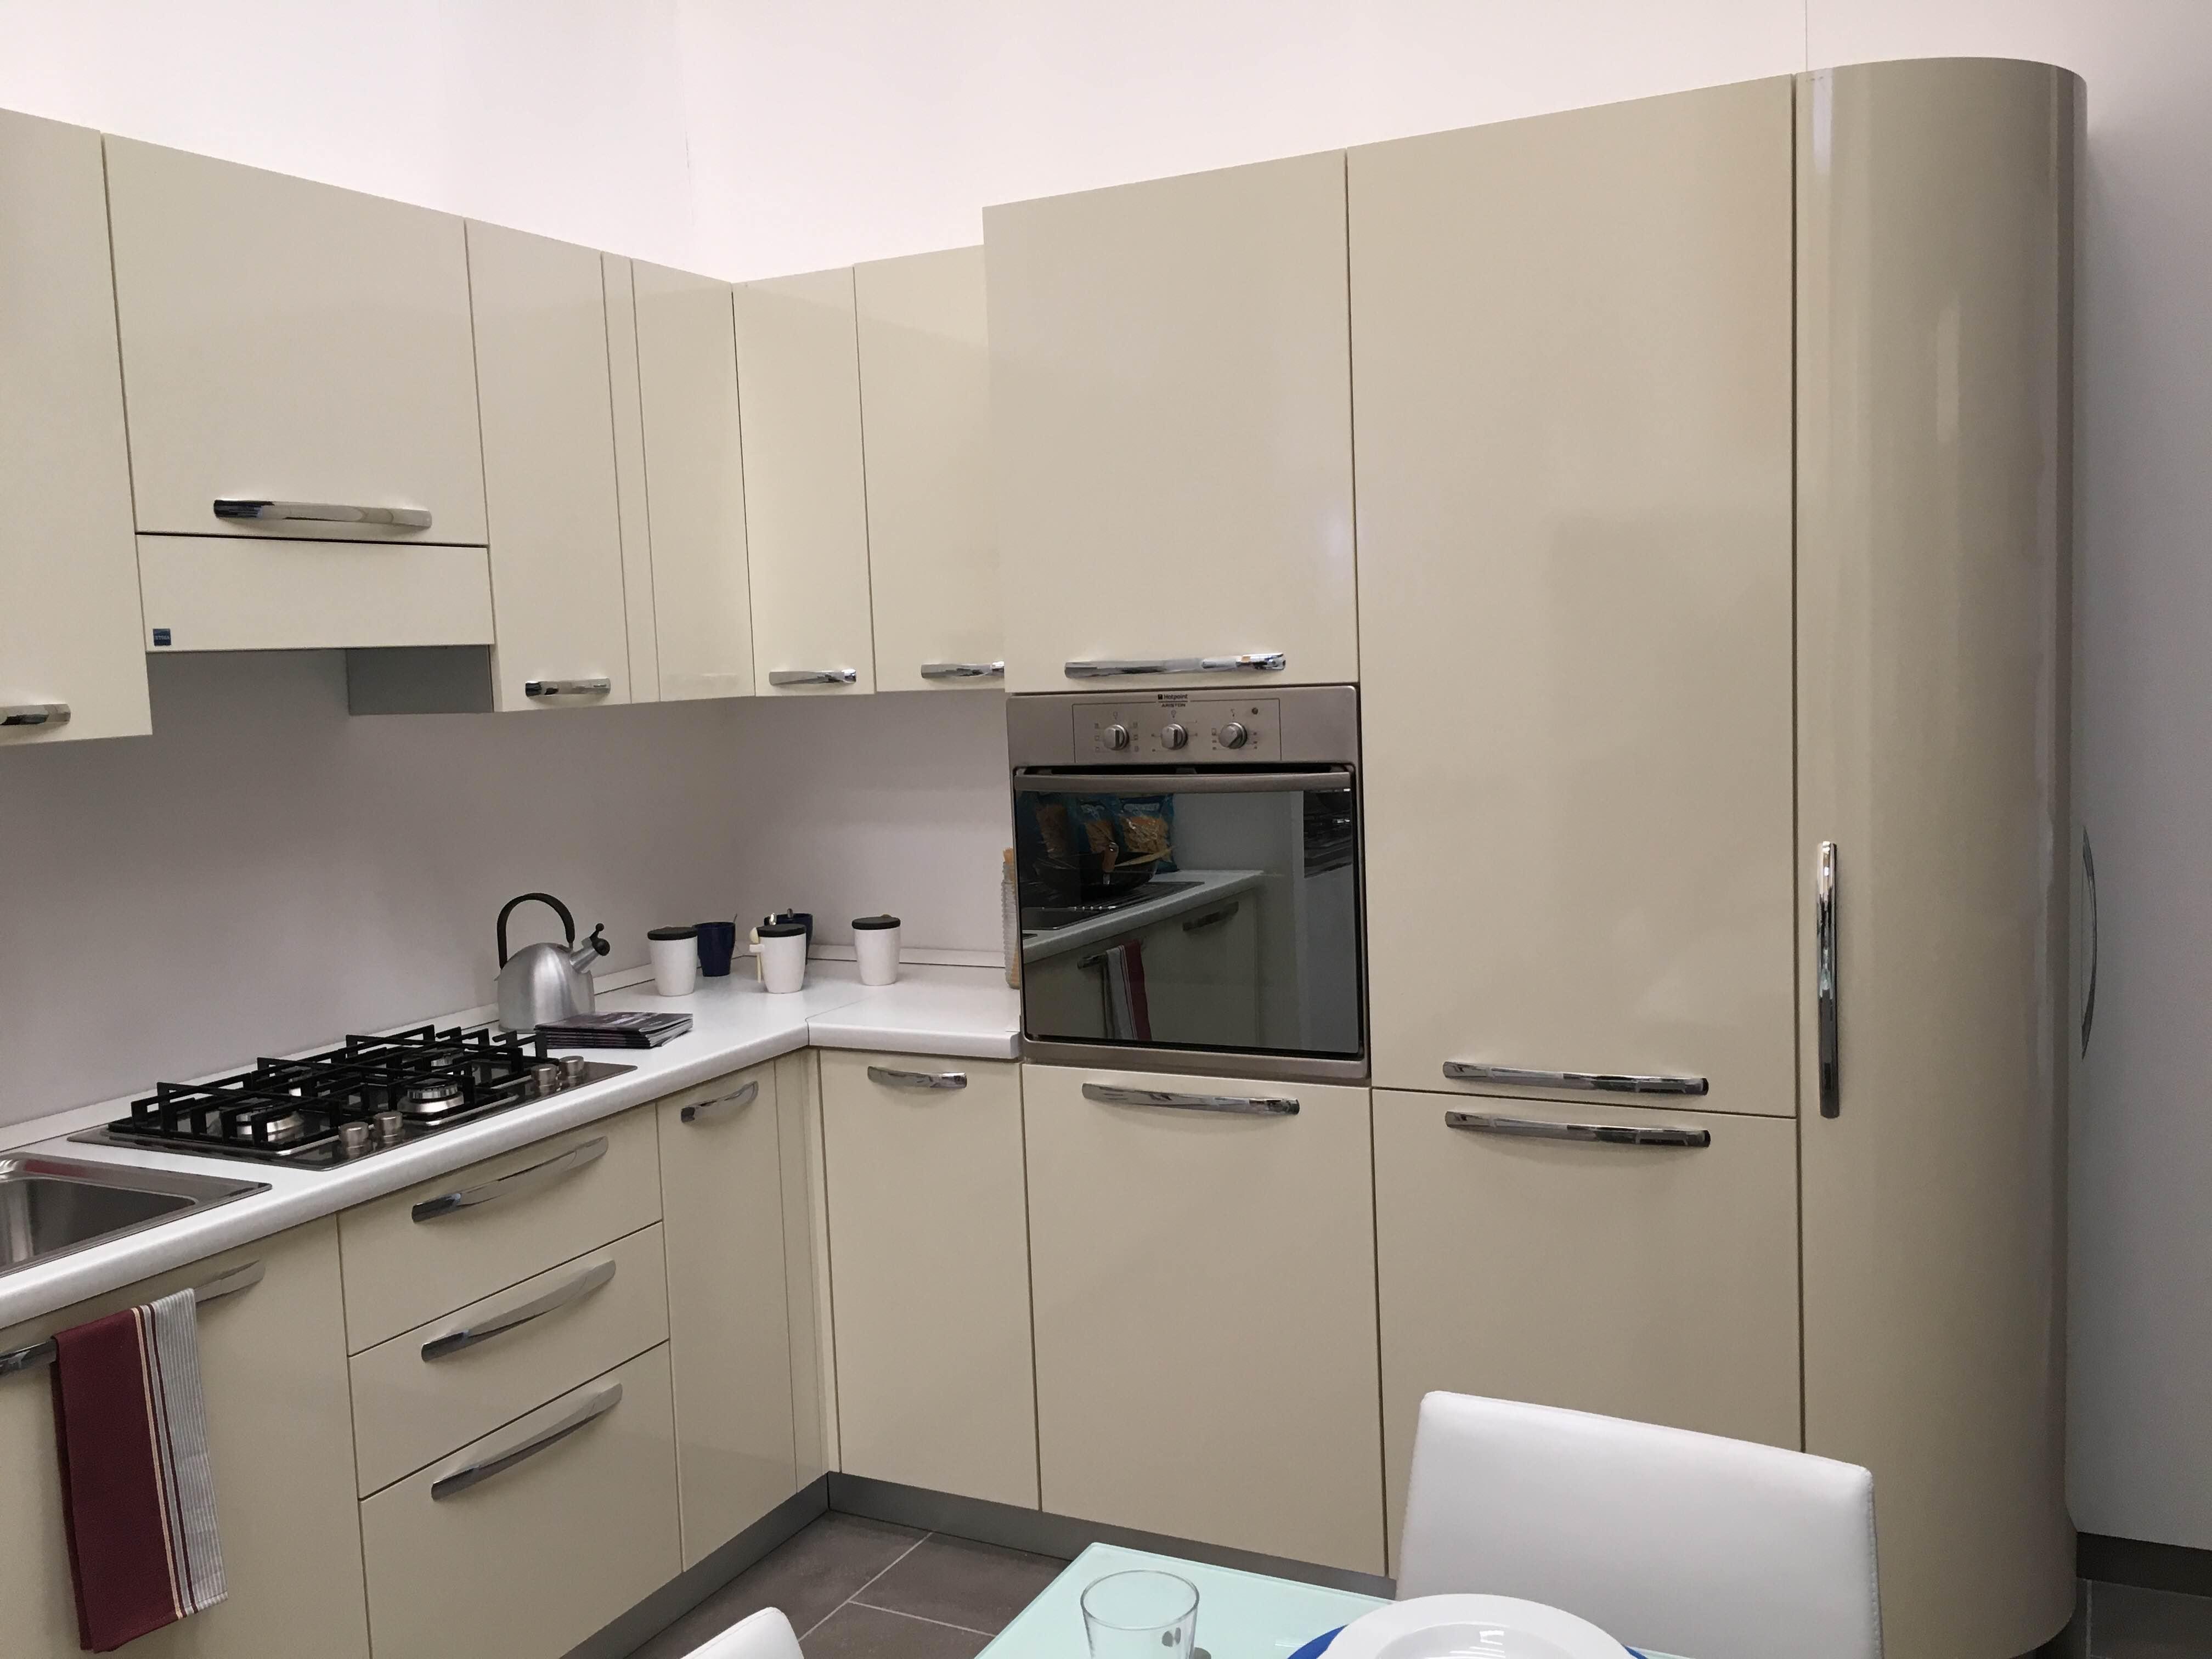 cucina stosa angolare. outlet - 40% - lorenzelli arredamenti - Cucine Stosa Outlet